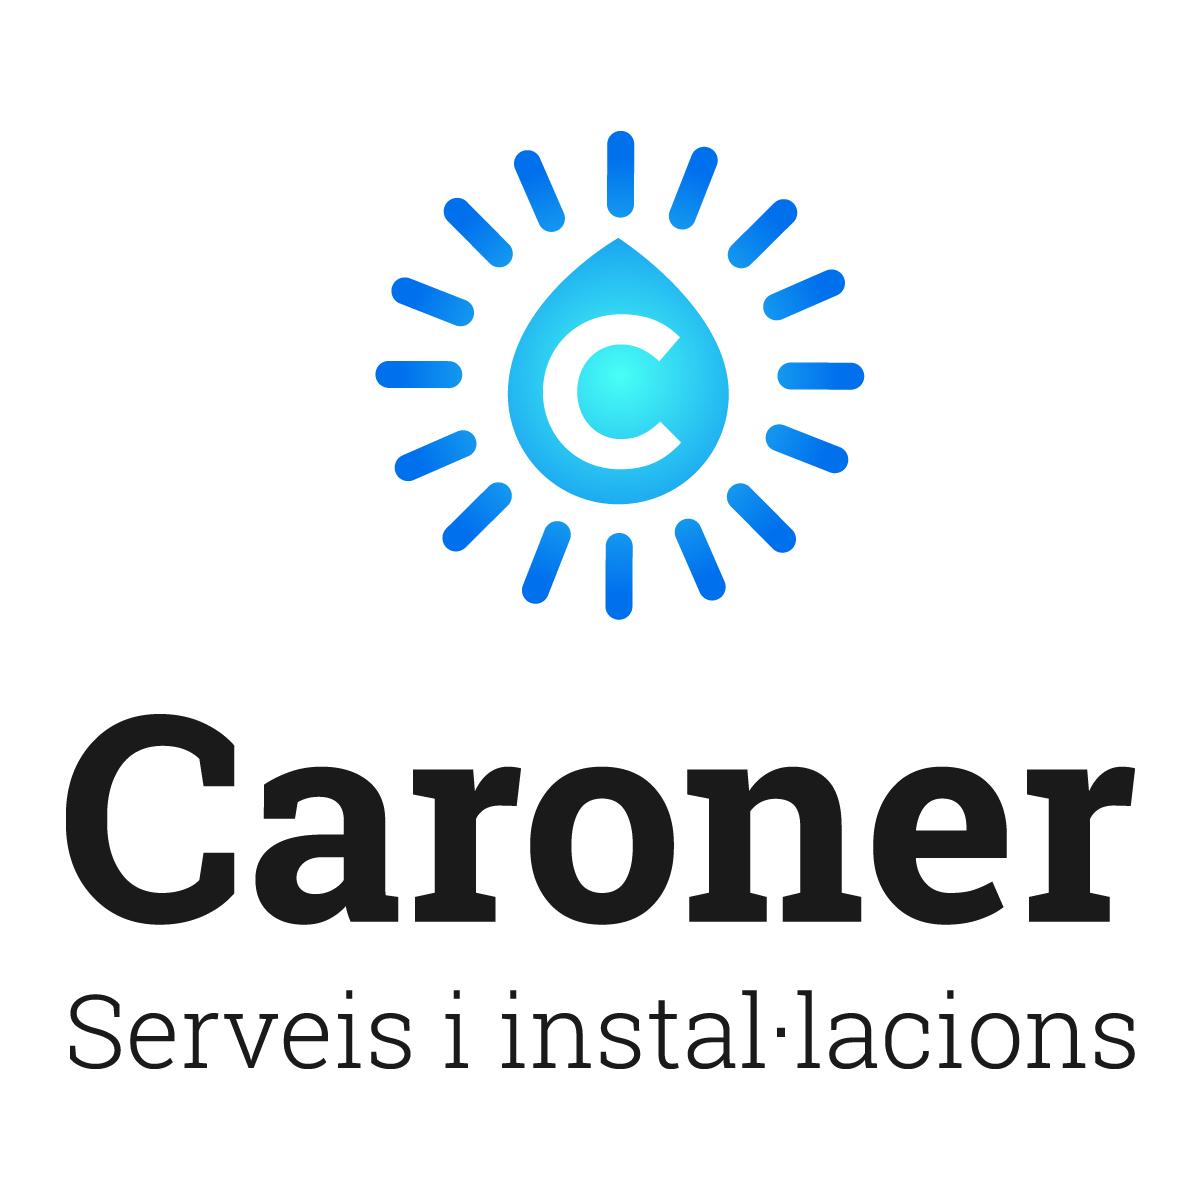 Servicios Caroner S.l